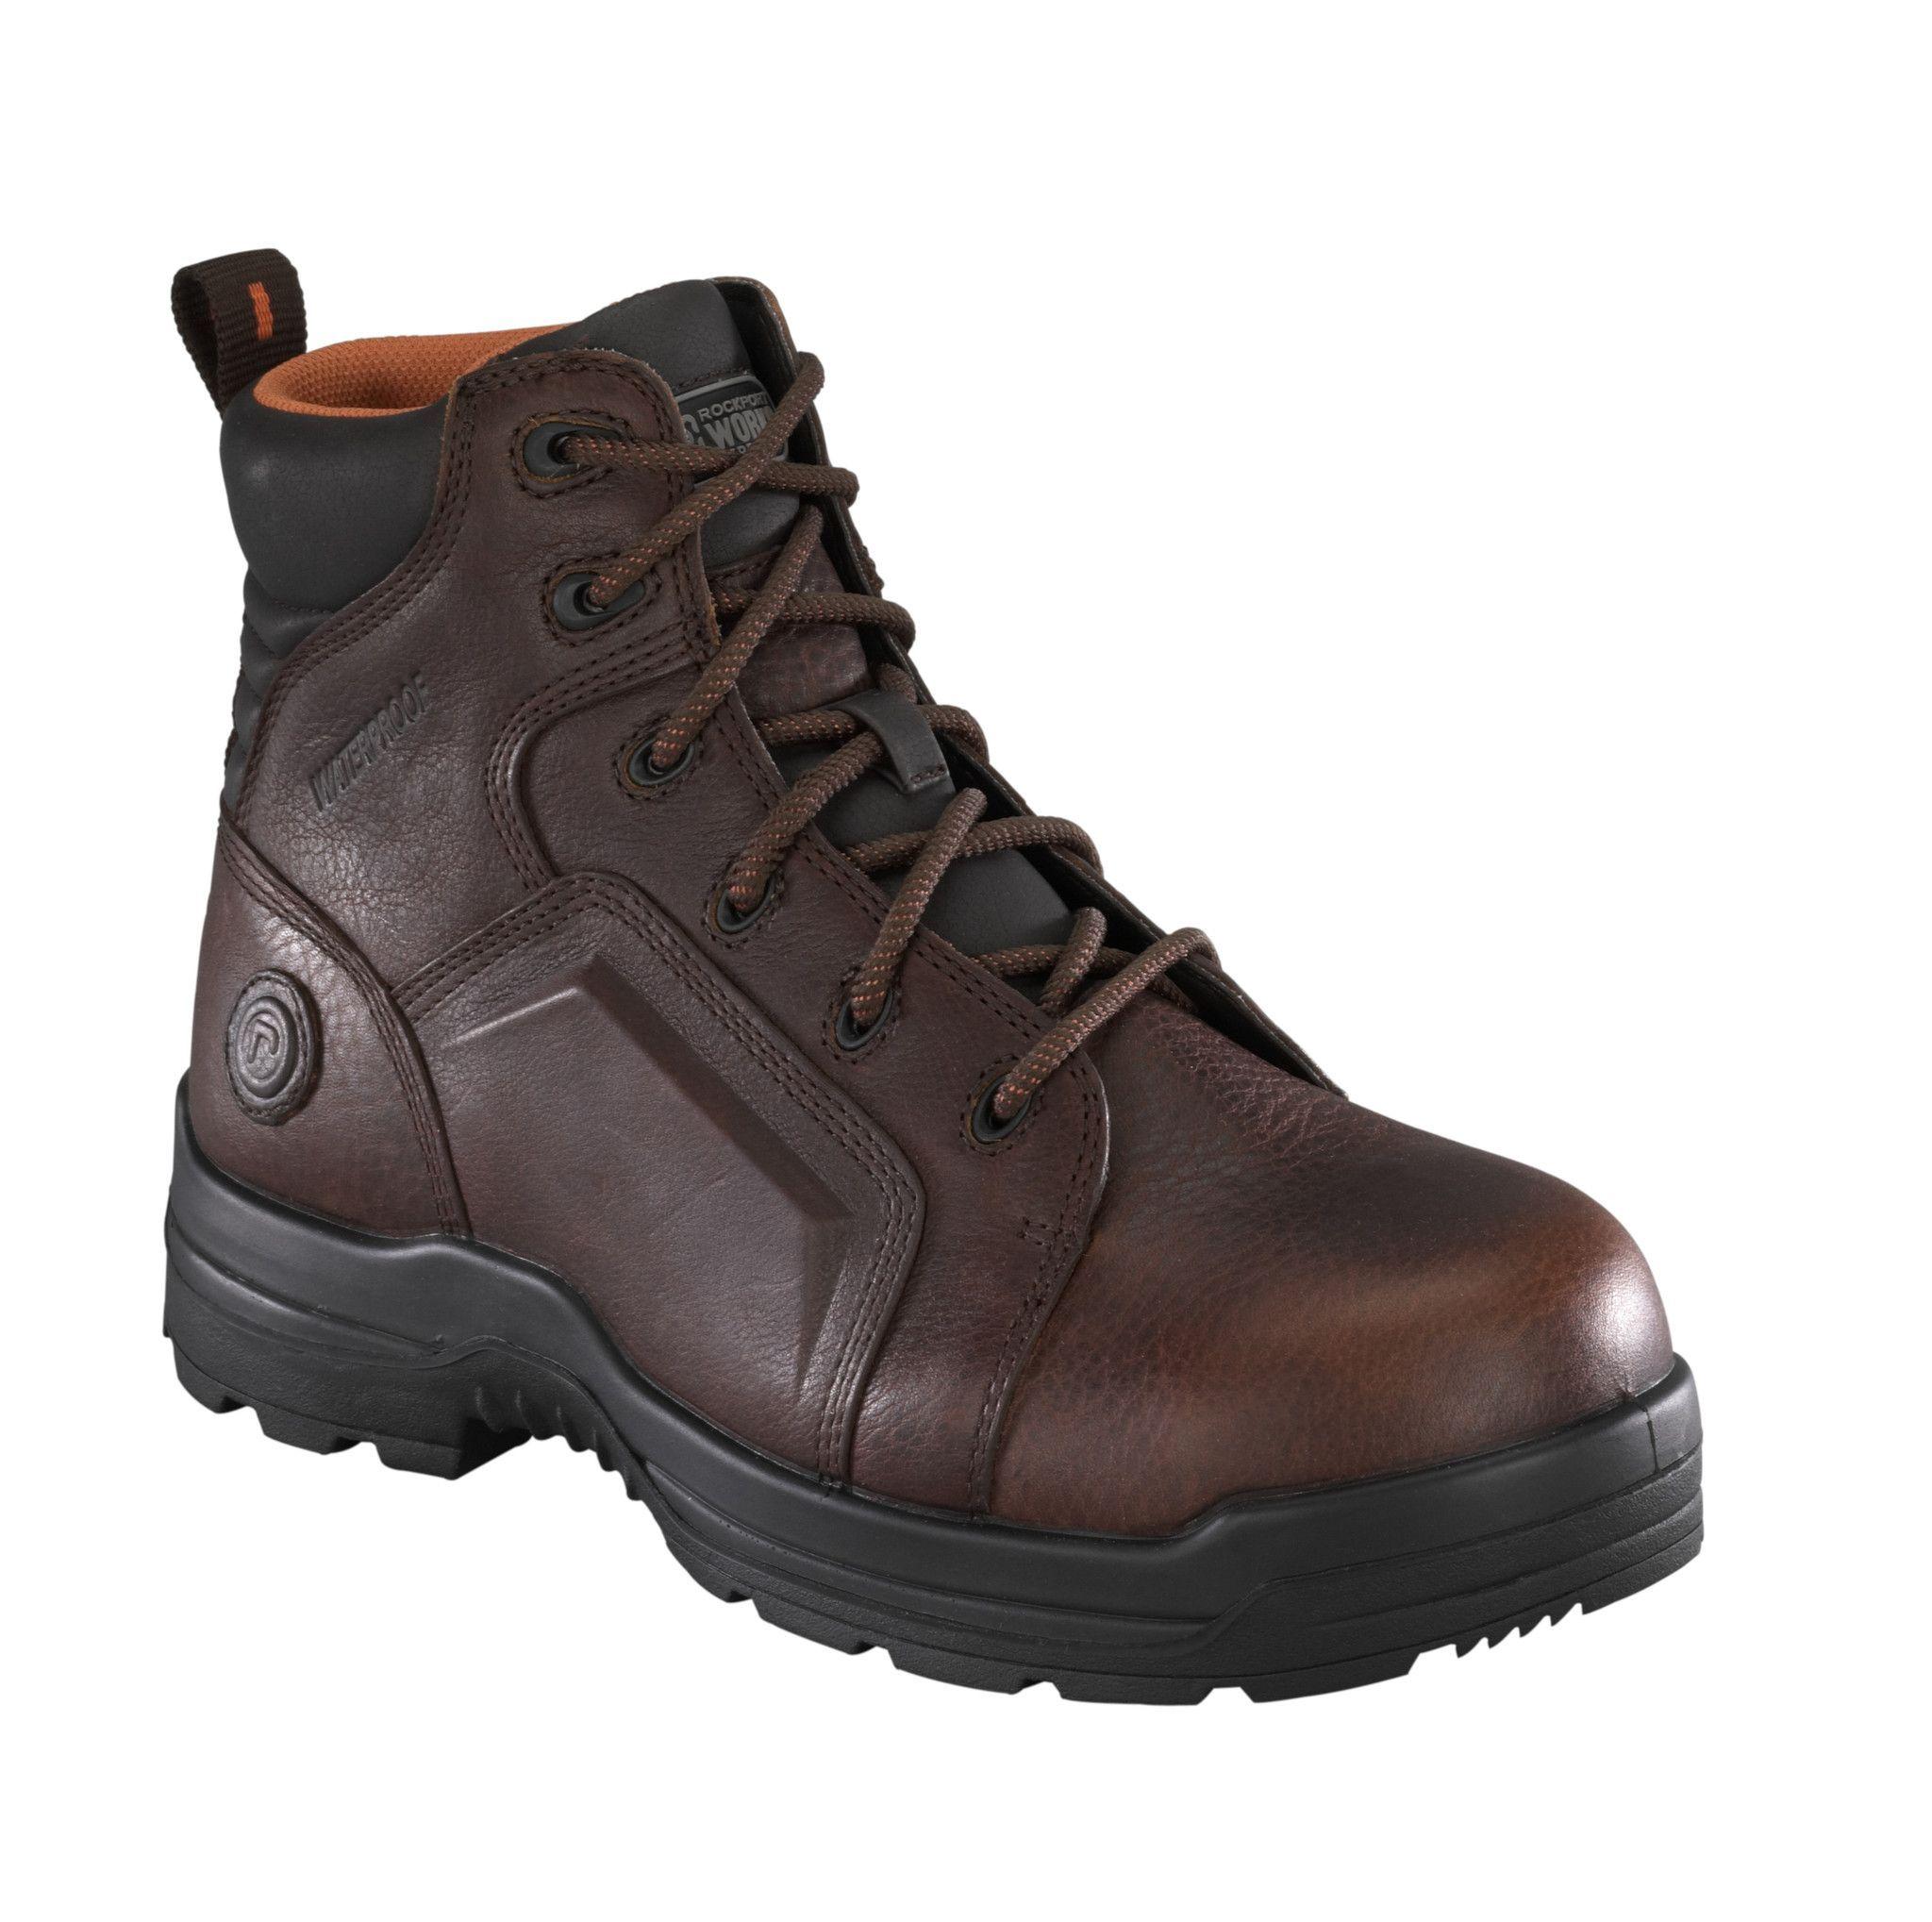 Mens Casual Shoes Carolina Ca7030 Mens Black Shoes Casual Shoes 2016 Sale Outlet